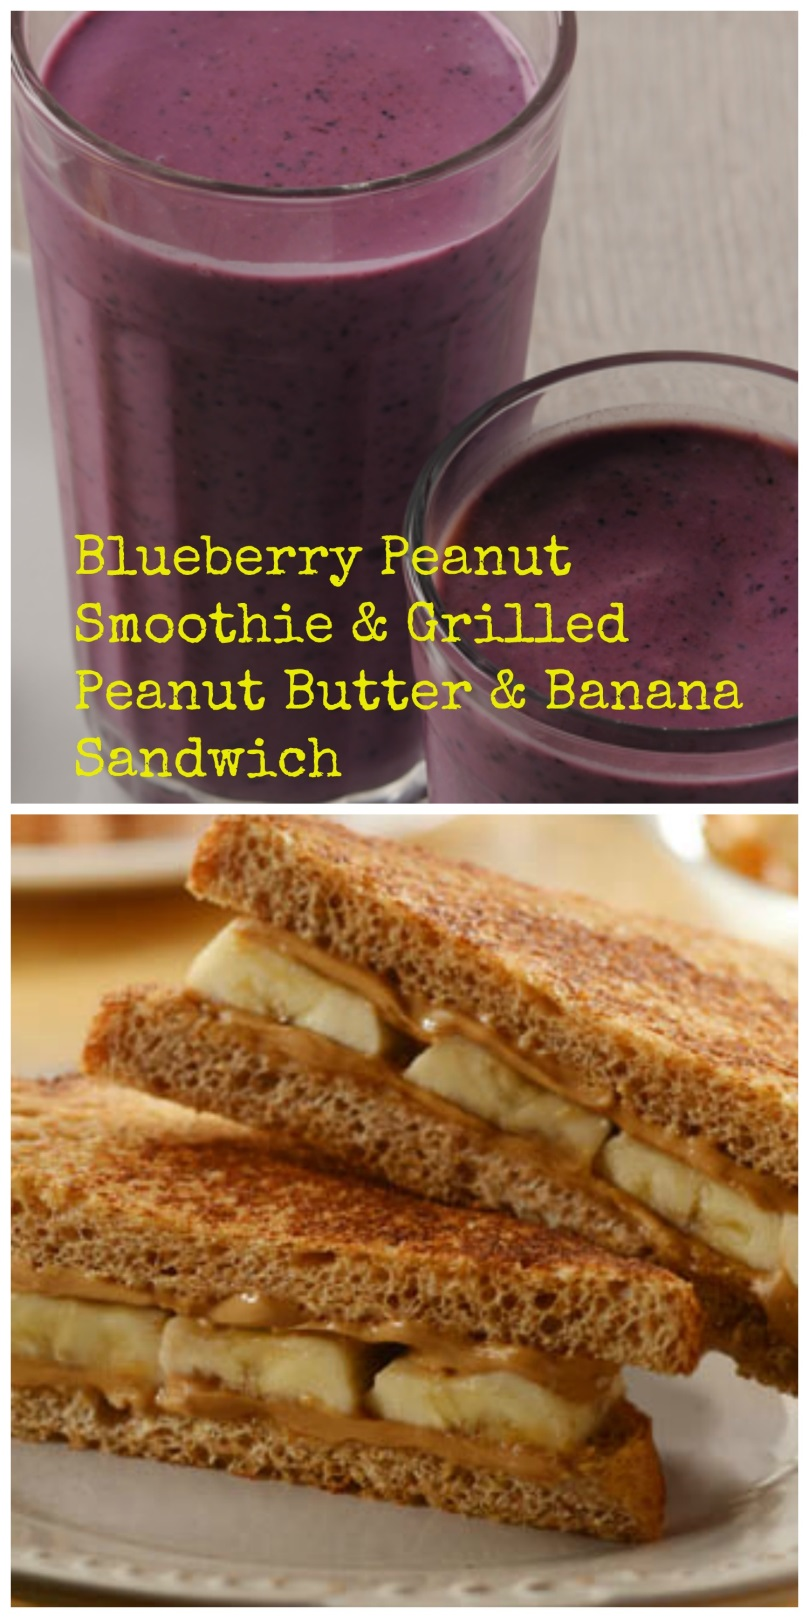 peanut_butter_sandwich_smoothie_collage_PB_board